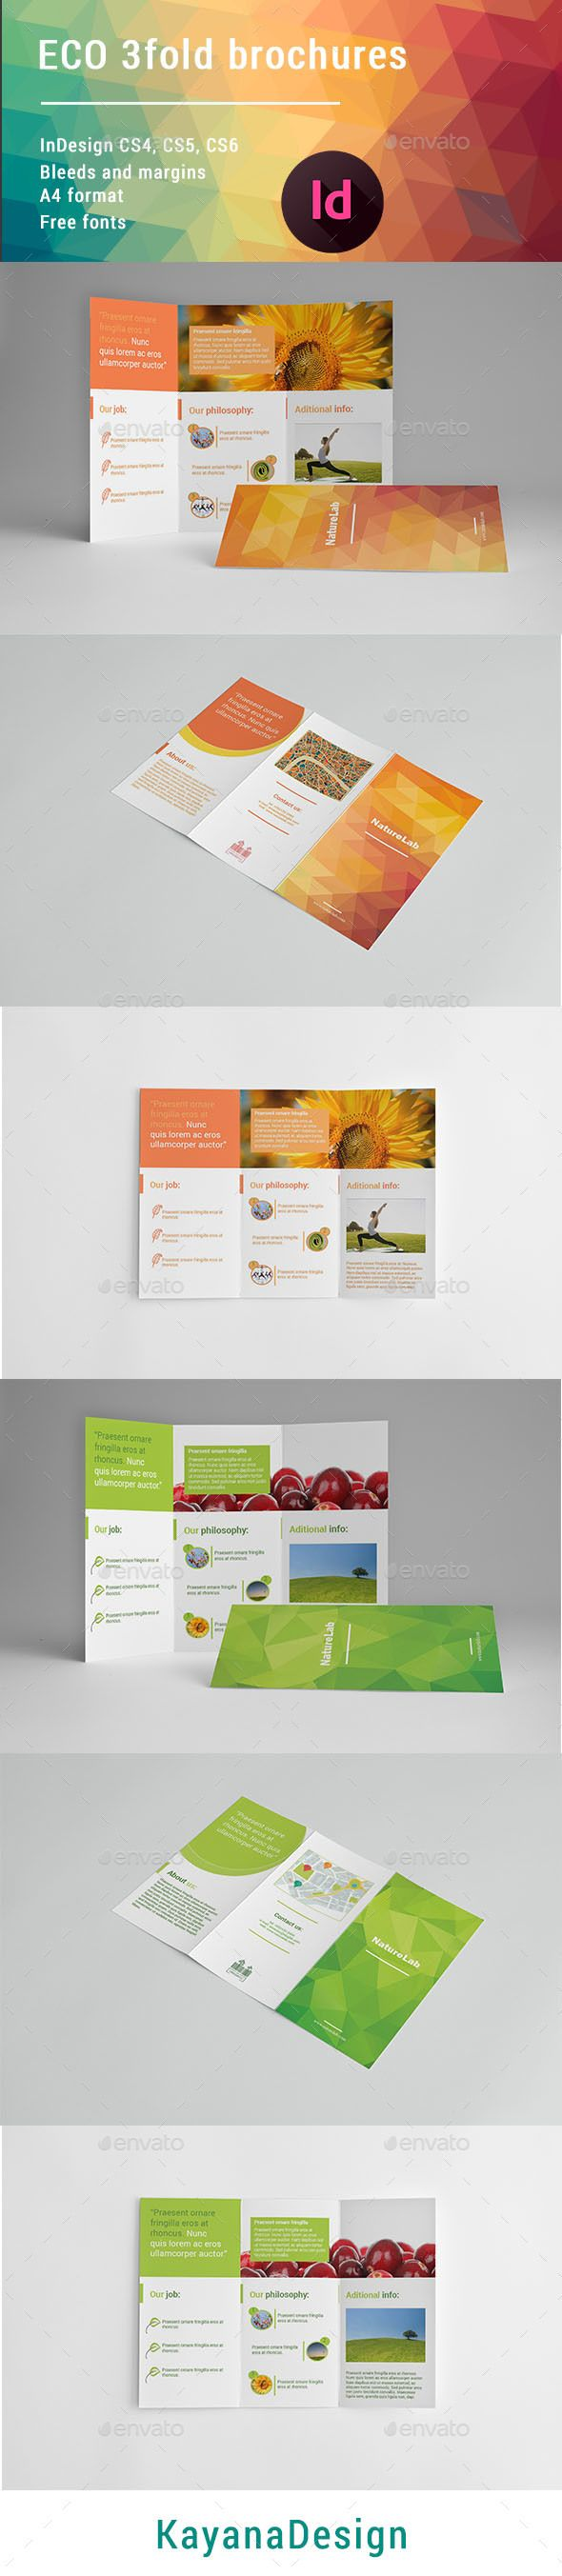 Best Fold Brochure Ideas On Pinterest Tri Fold Tri Fold - 3 folded brochure template